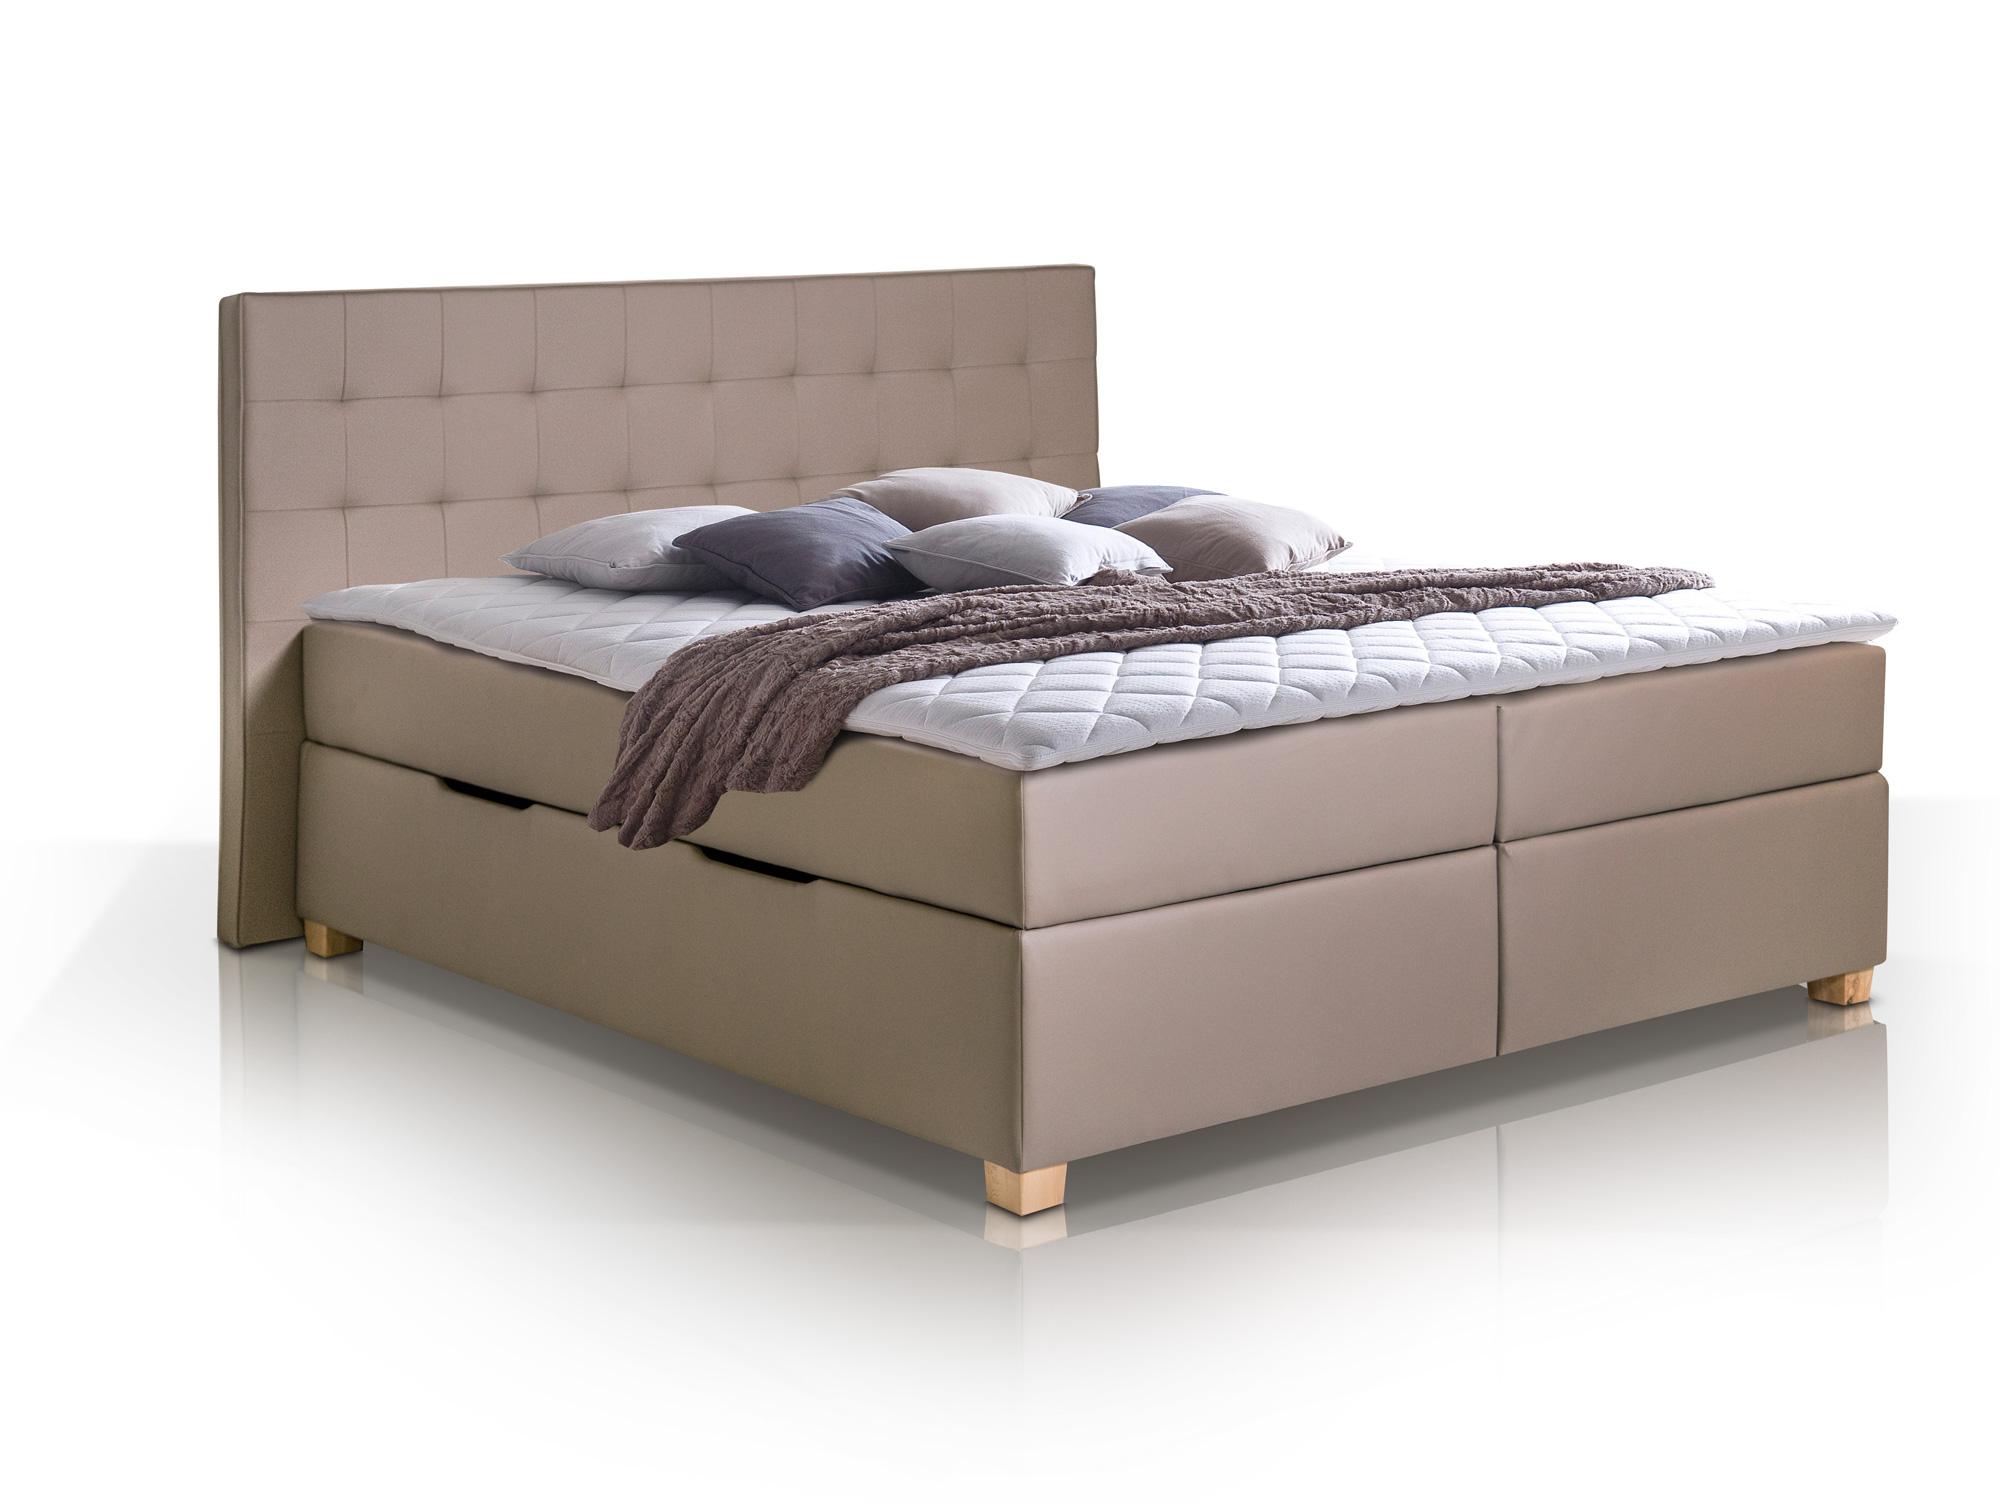 ida boxspringbett kunstleder mit bettkasten 200 x 200 cm. Black Bedroom Furniture Sets. Home Design Ideas